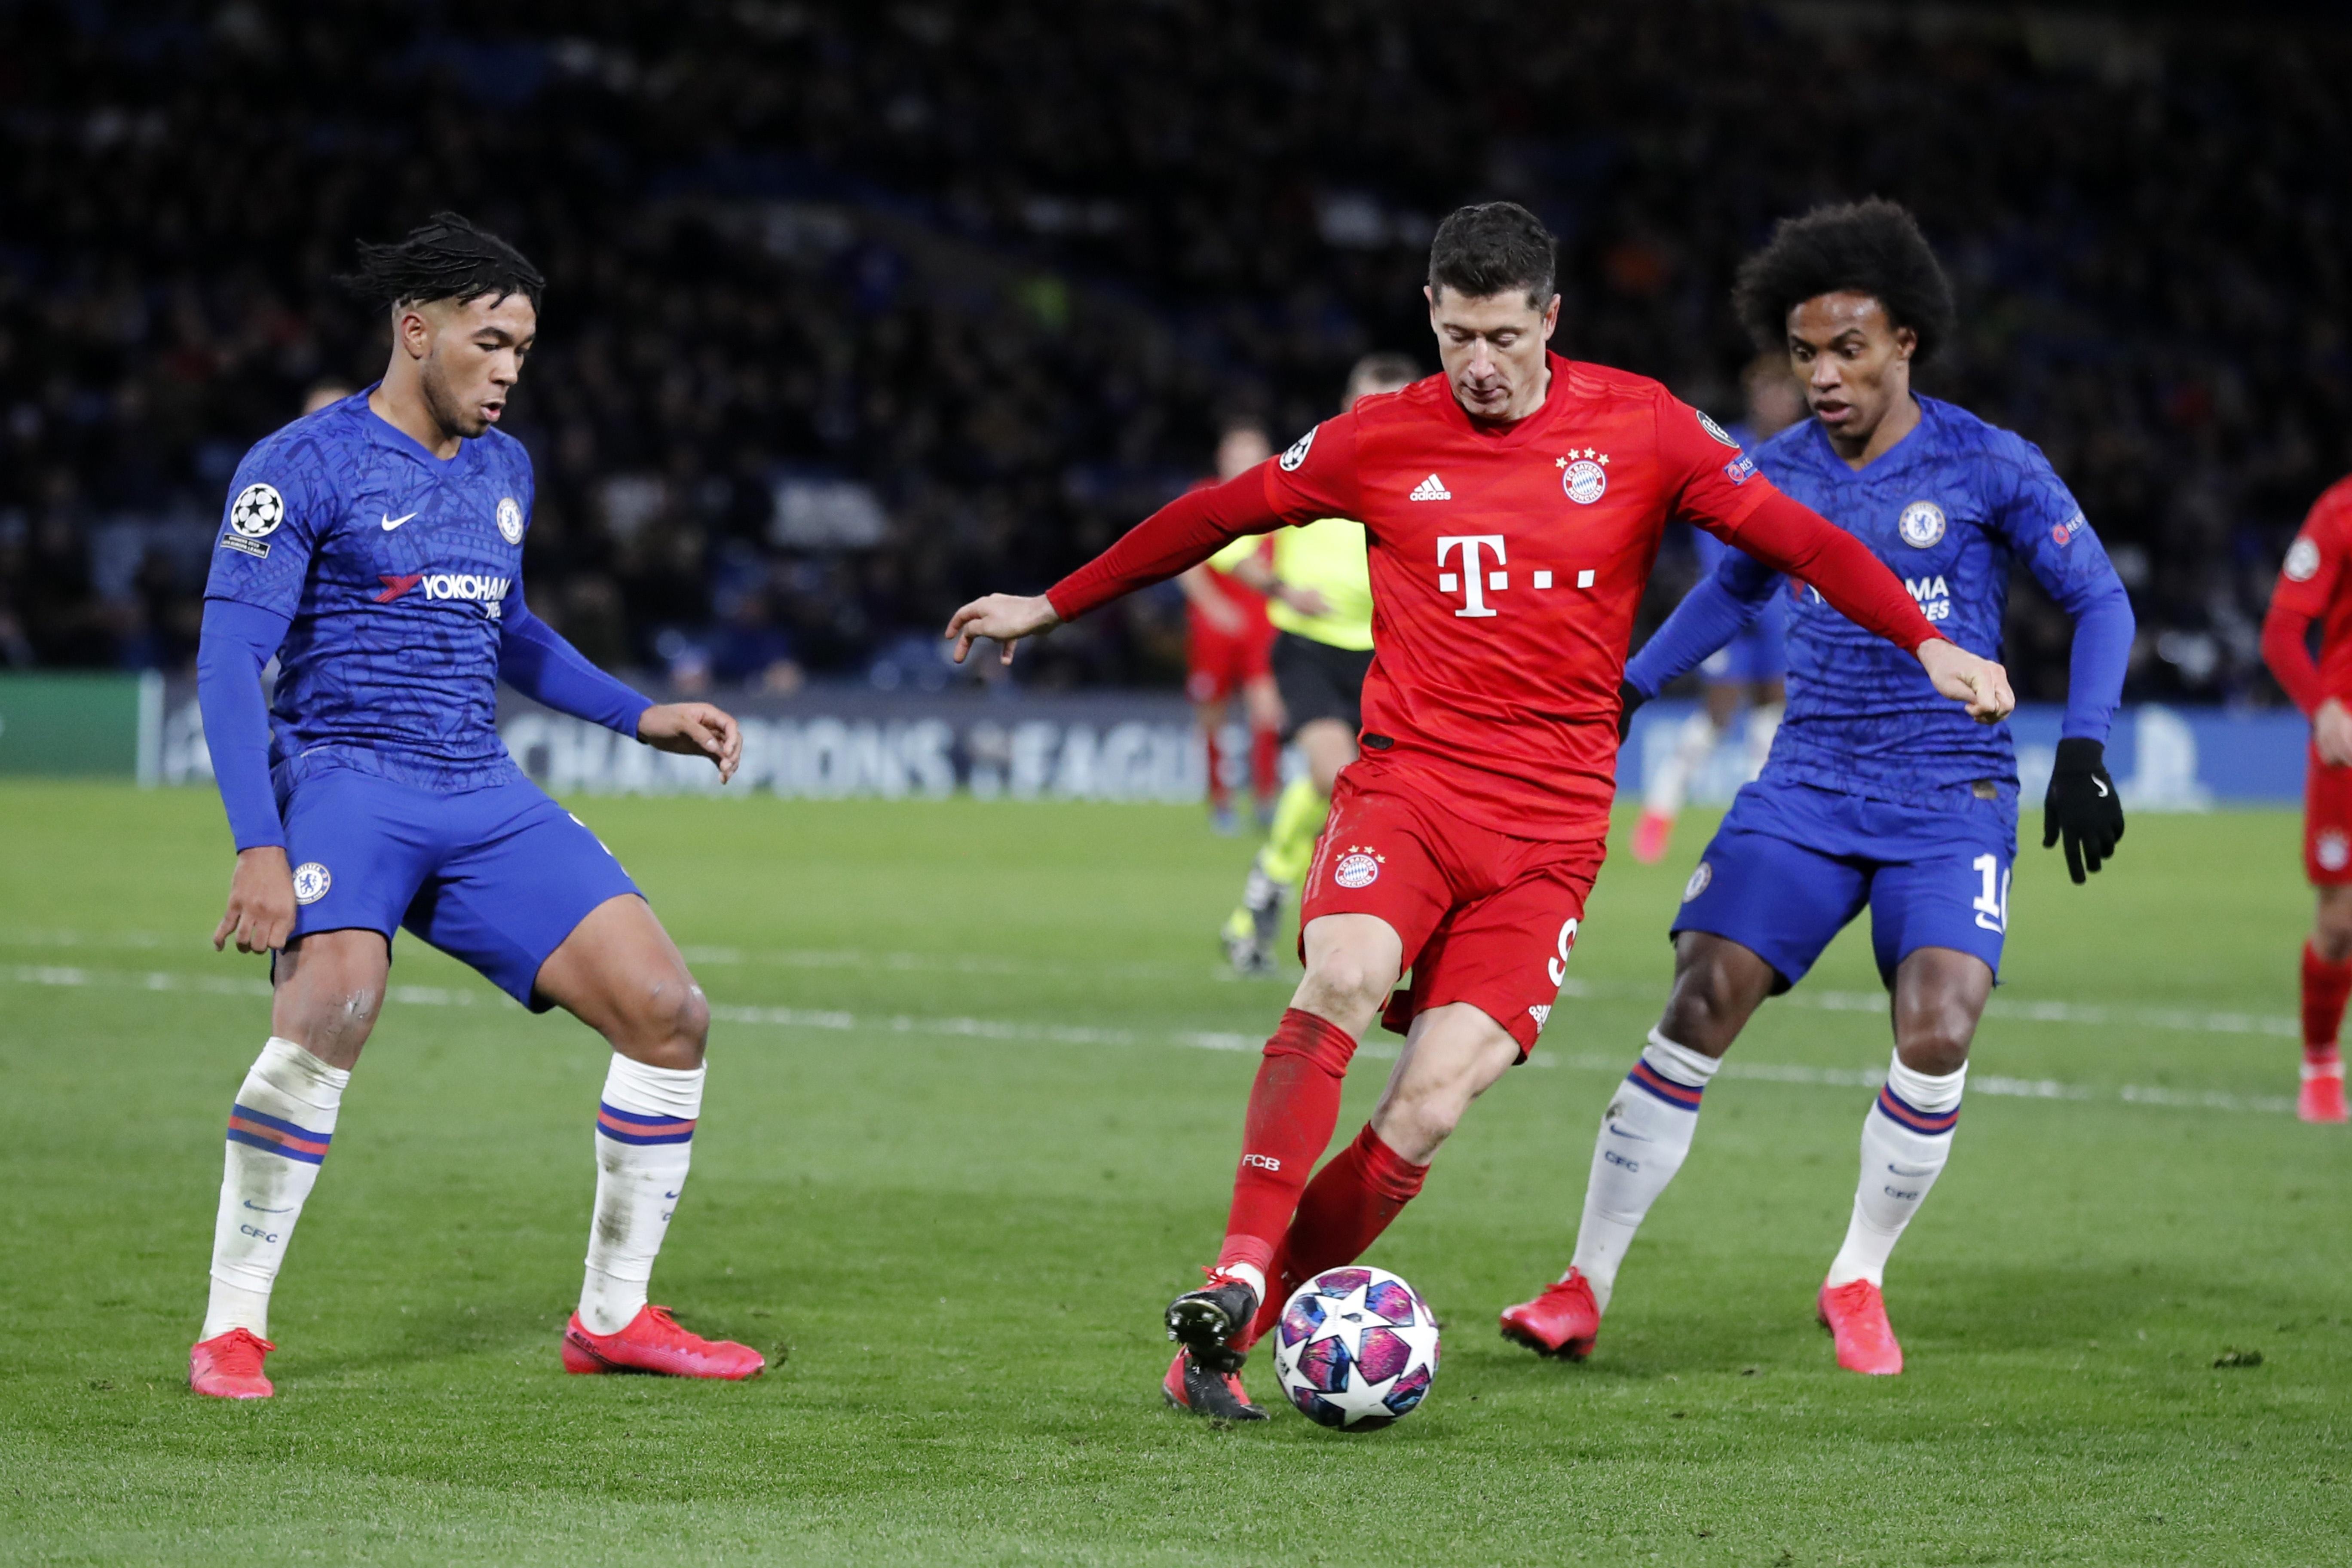 Bayern striker Lewandowski ruled out 4 weeks with fracture